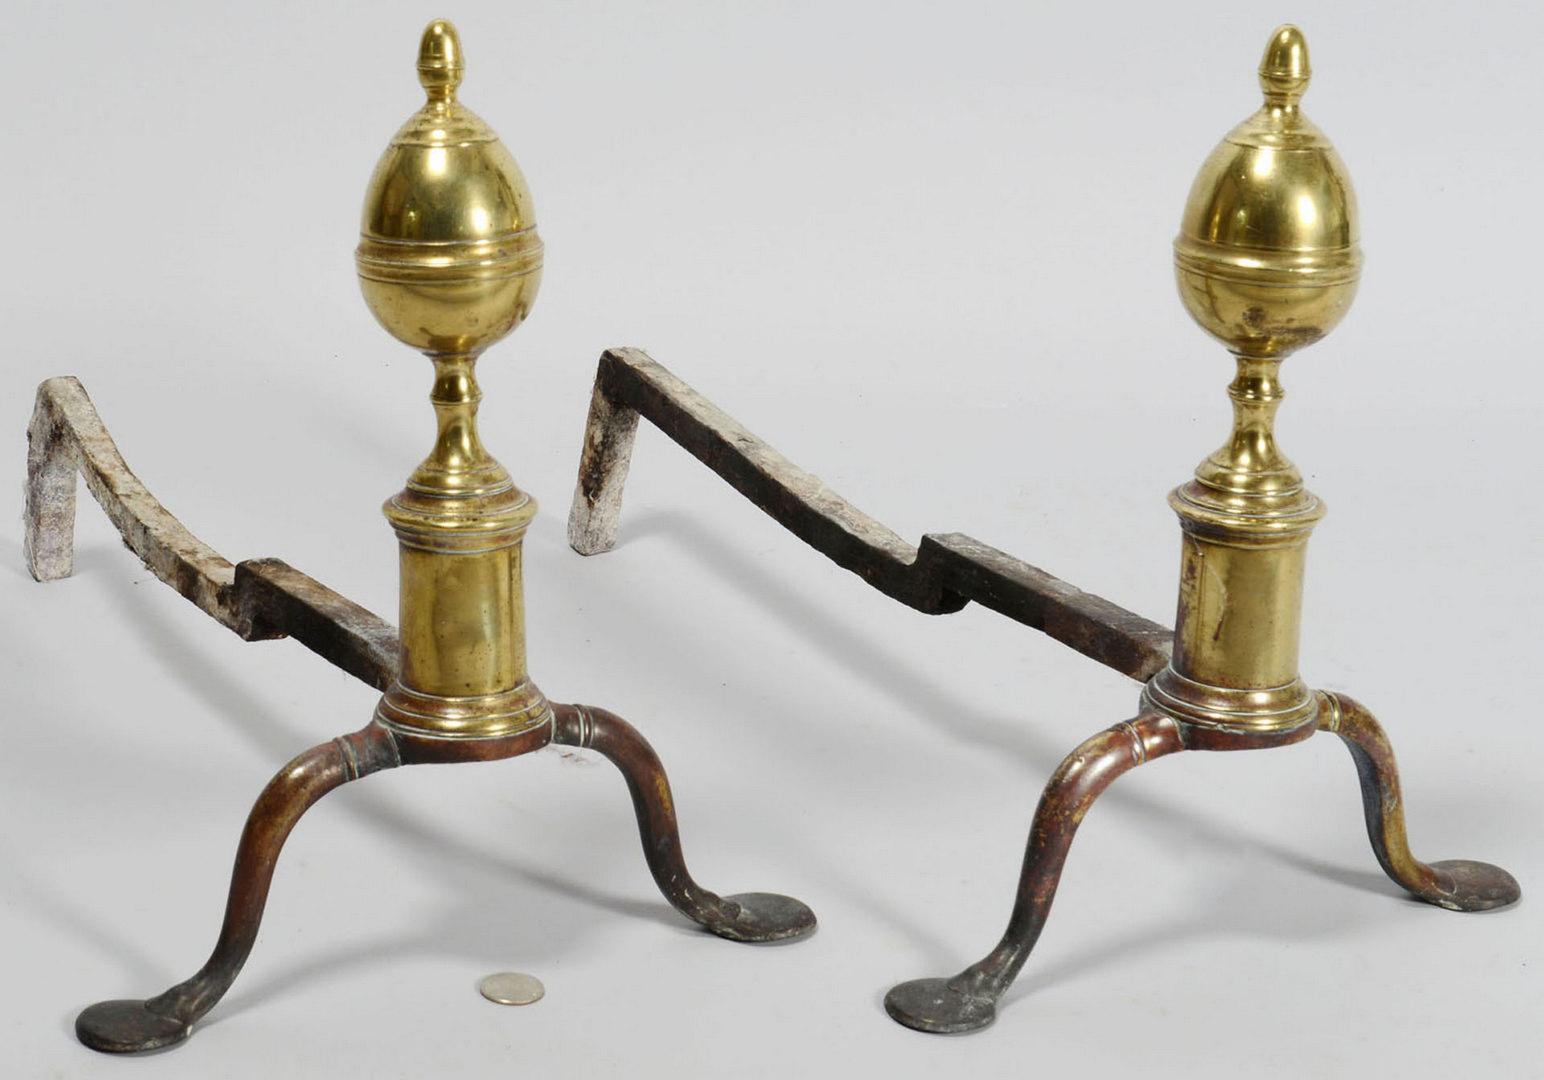 Lot 583: Small Brass Acorn or Lemon Top Andirons